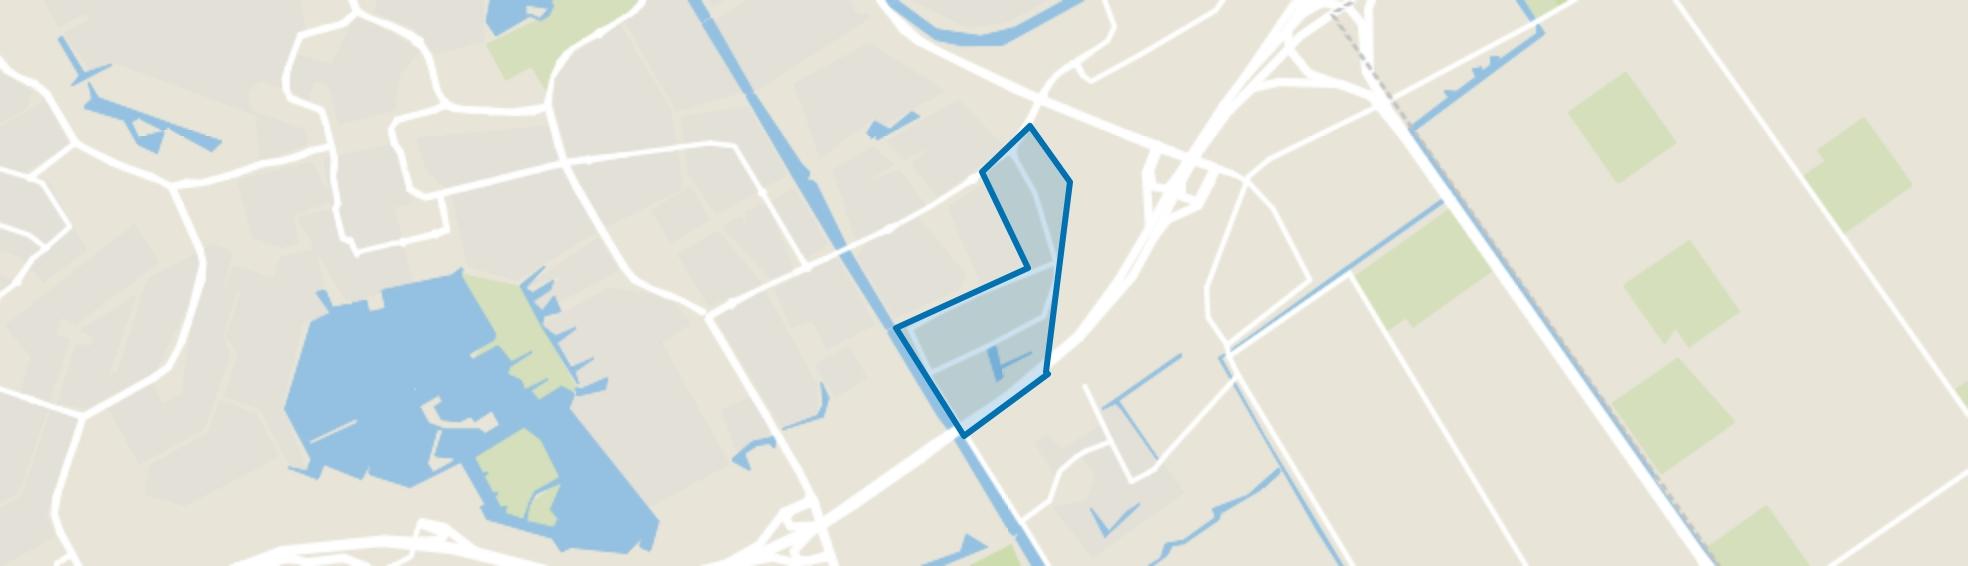 Sallandsekant, Almere map